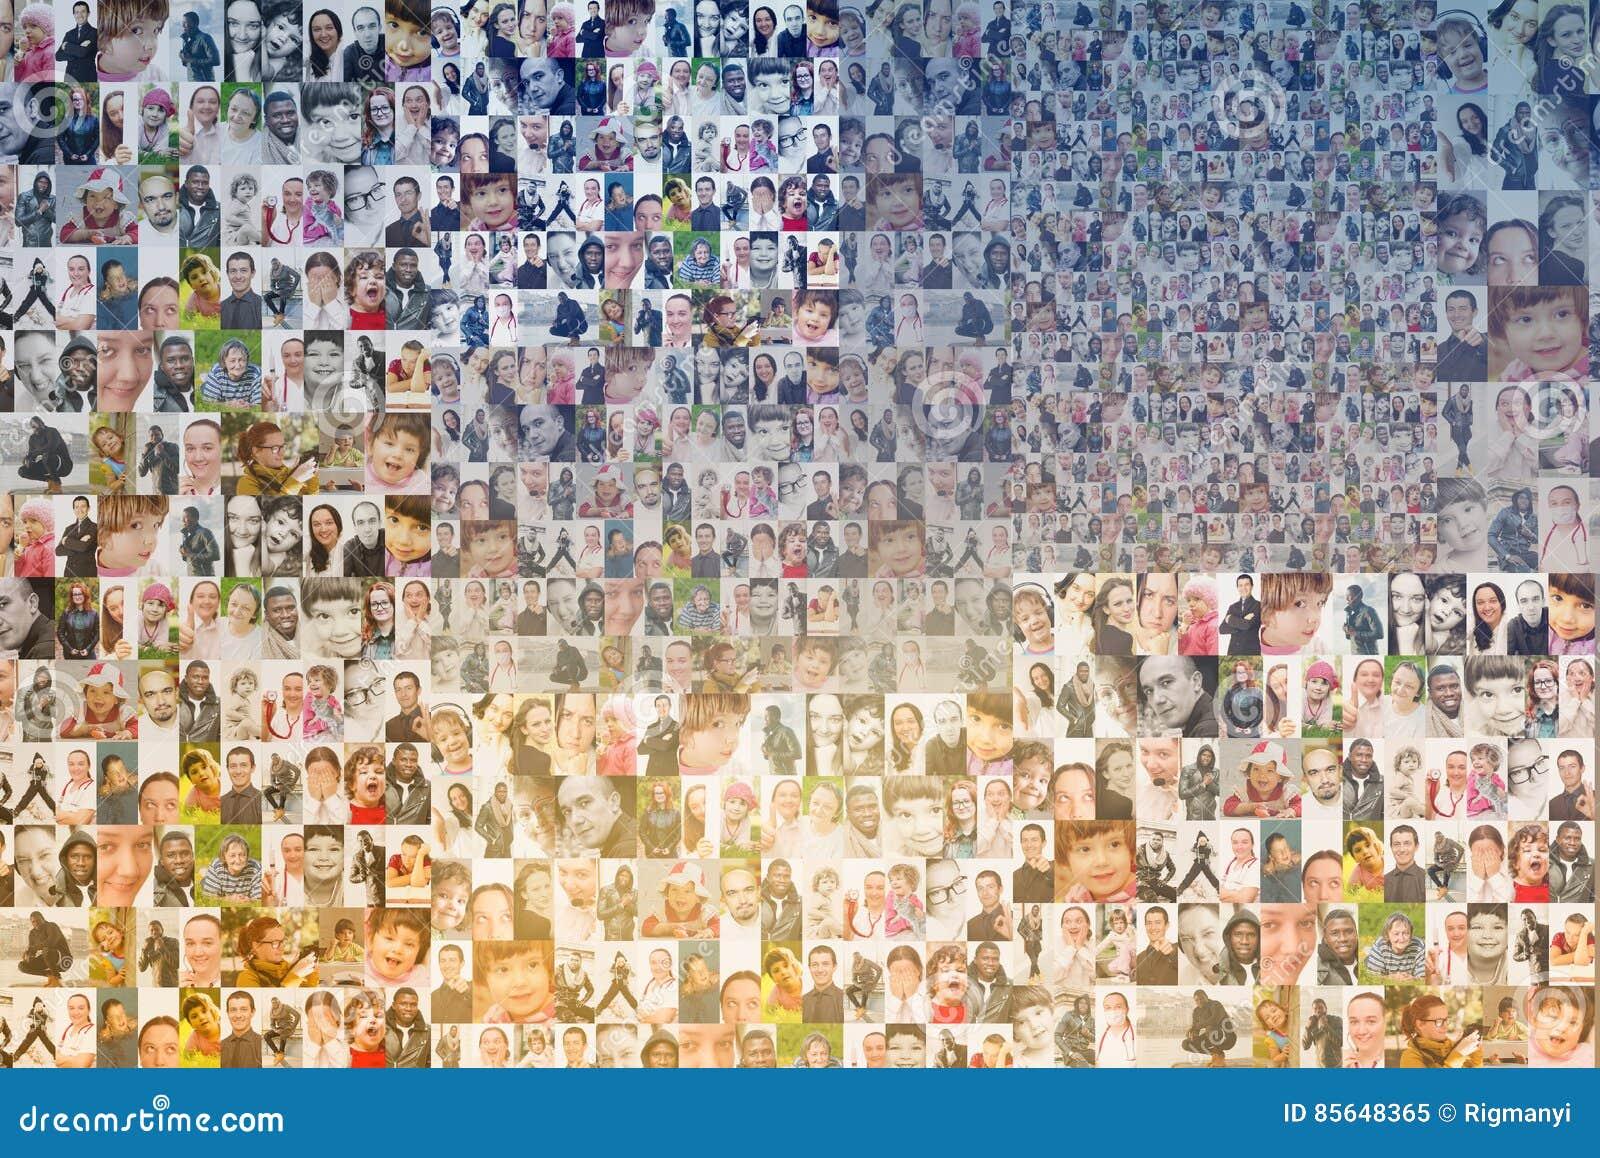 People mosaic background